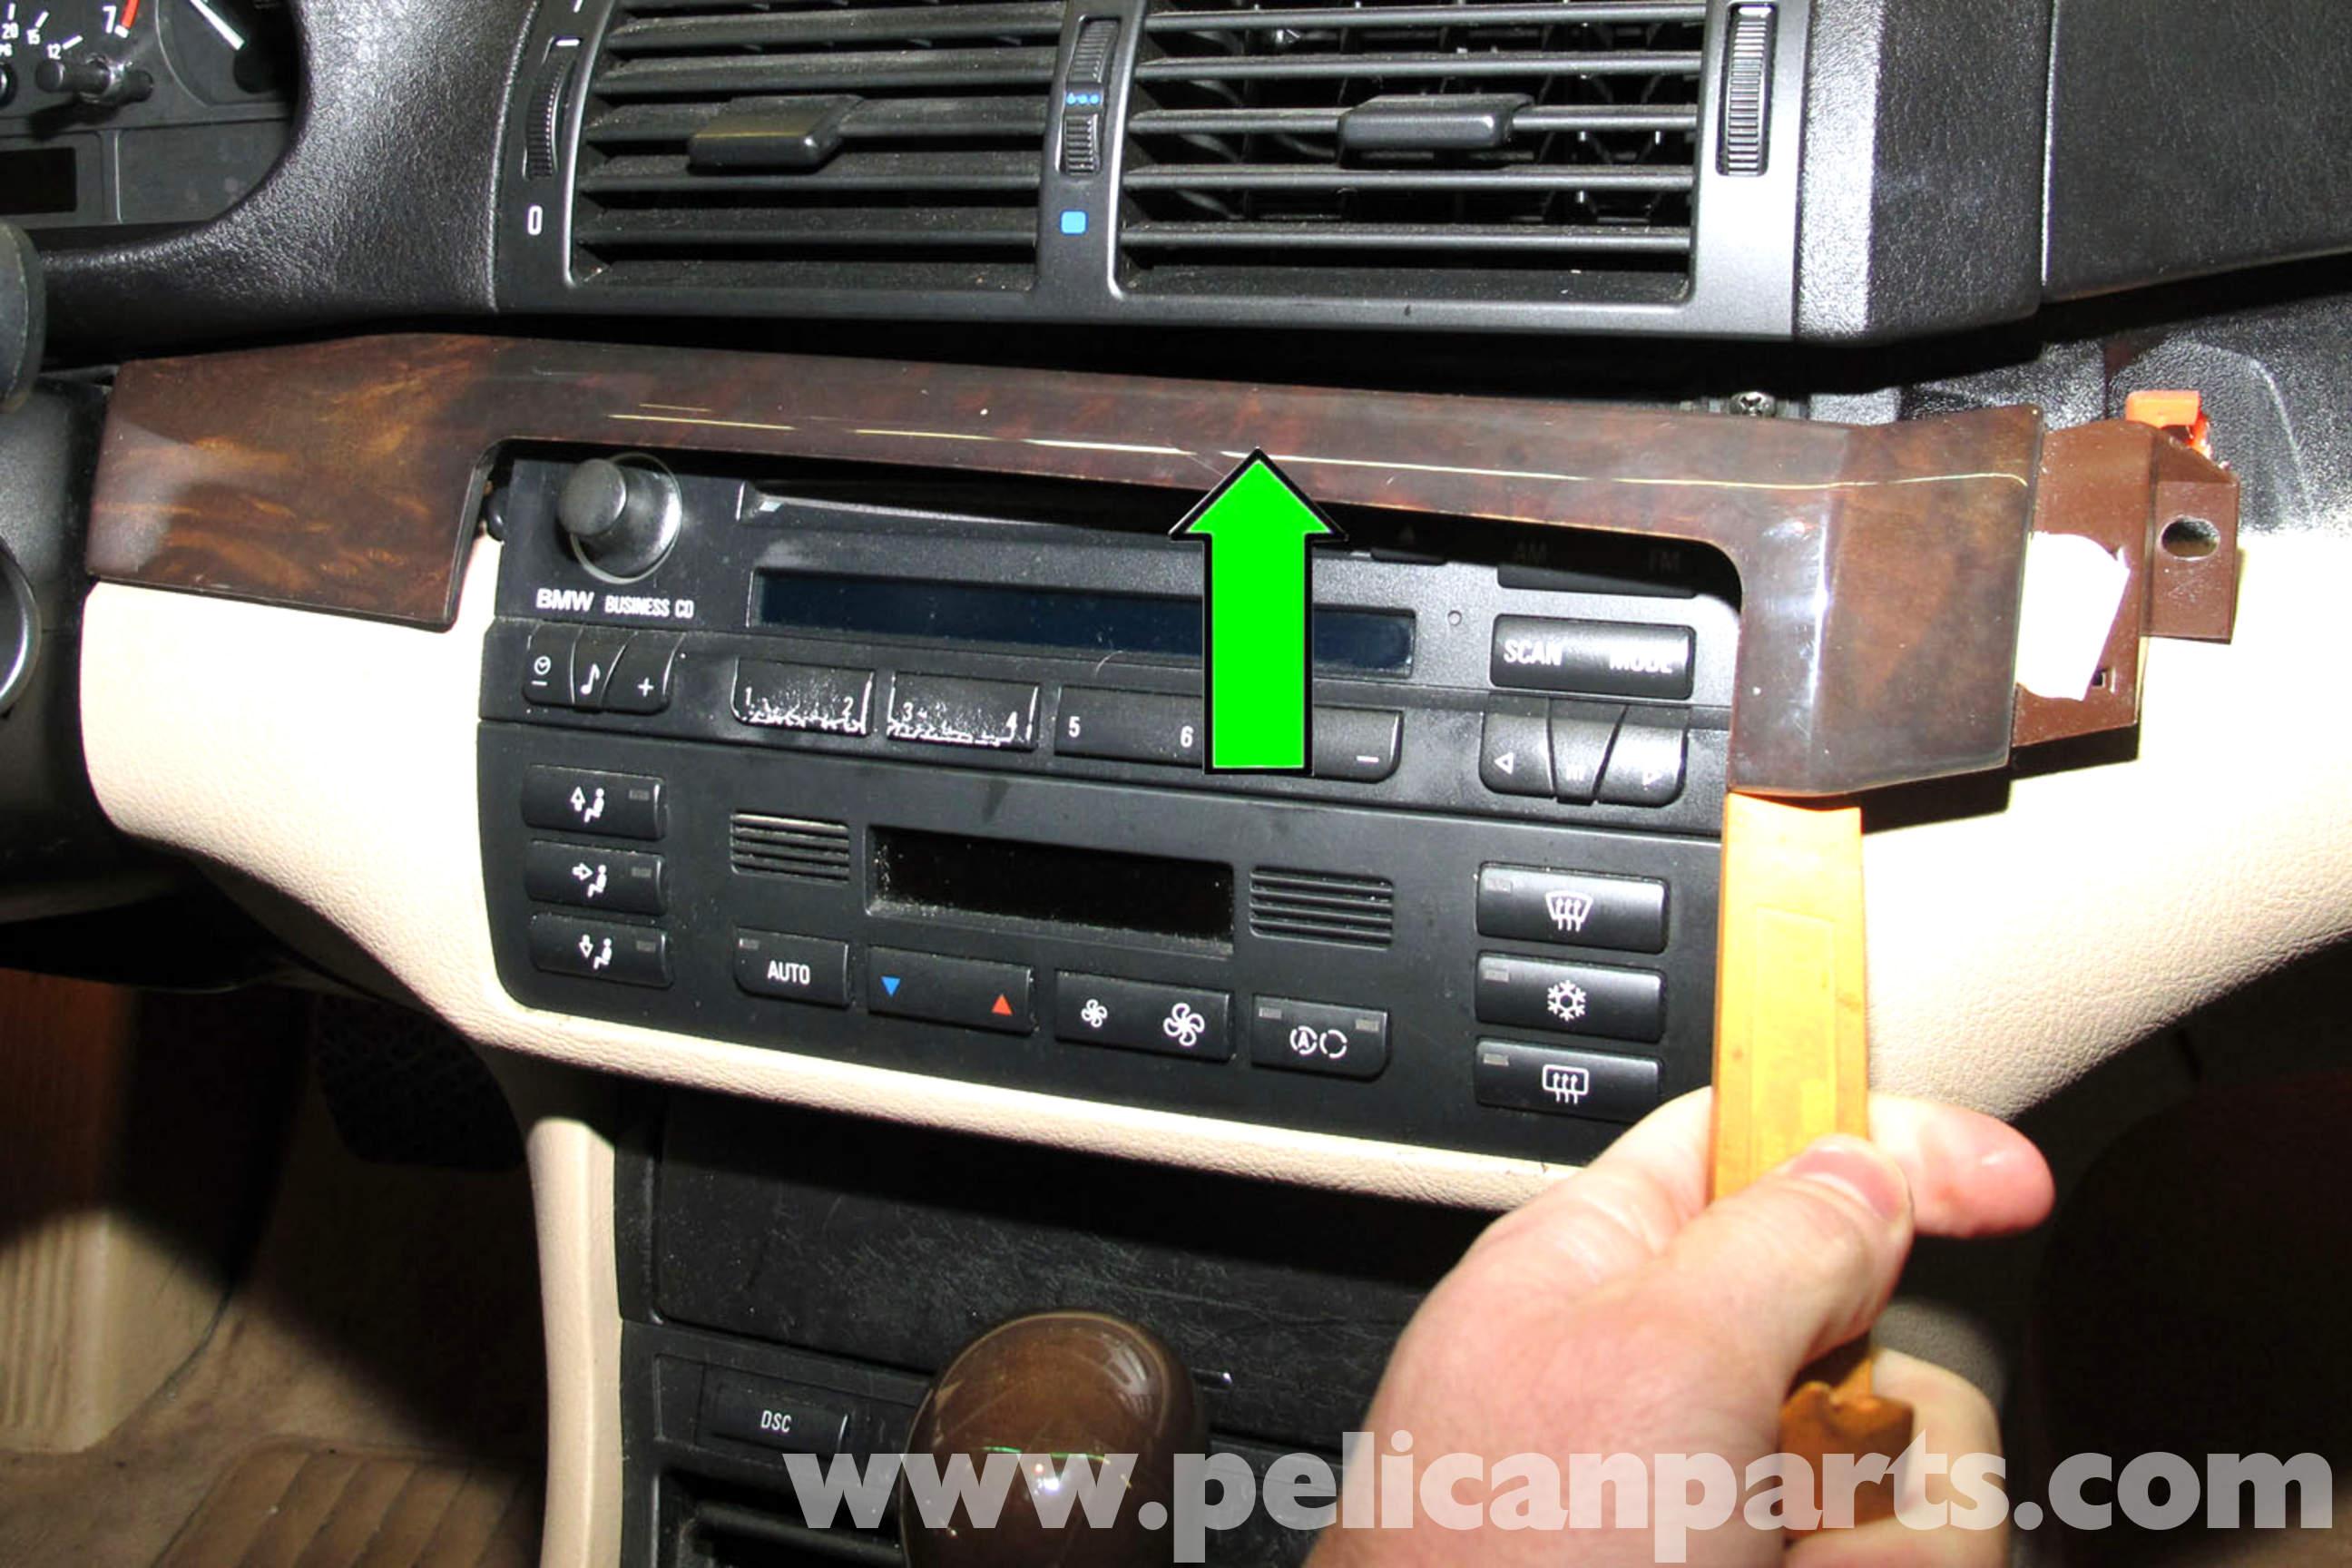 bmw e46 radio cd changer replacement bmw 325i 2001 2005. Black Bedroom Furniture Sets. Home Design Ideas